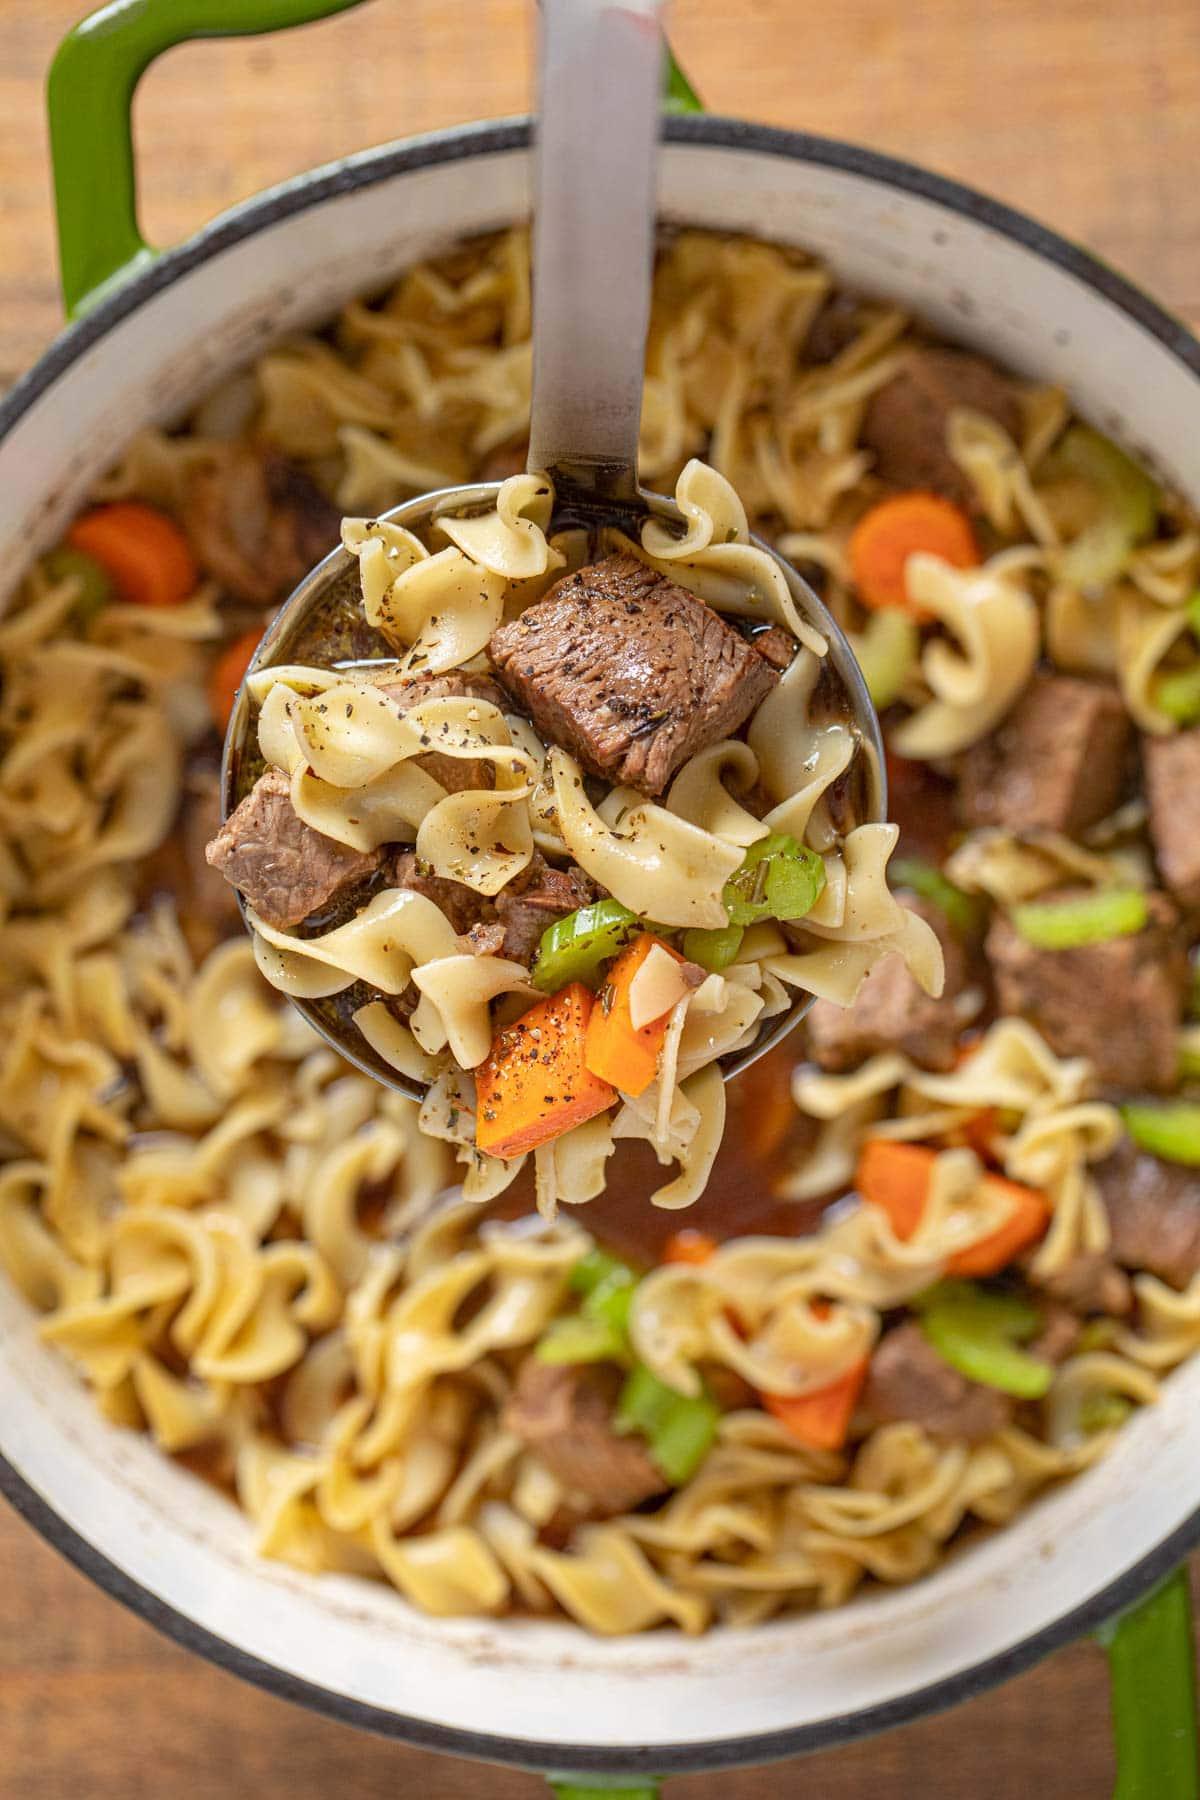 Beef Noodle Soup serving in ladle